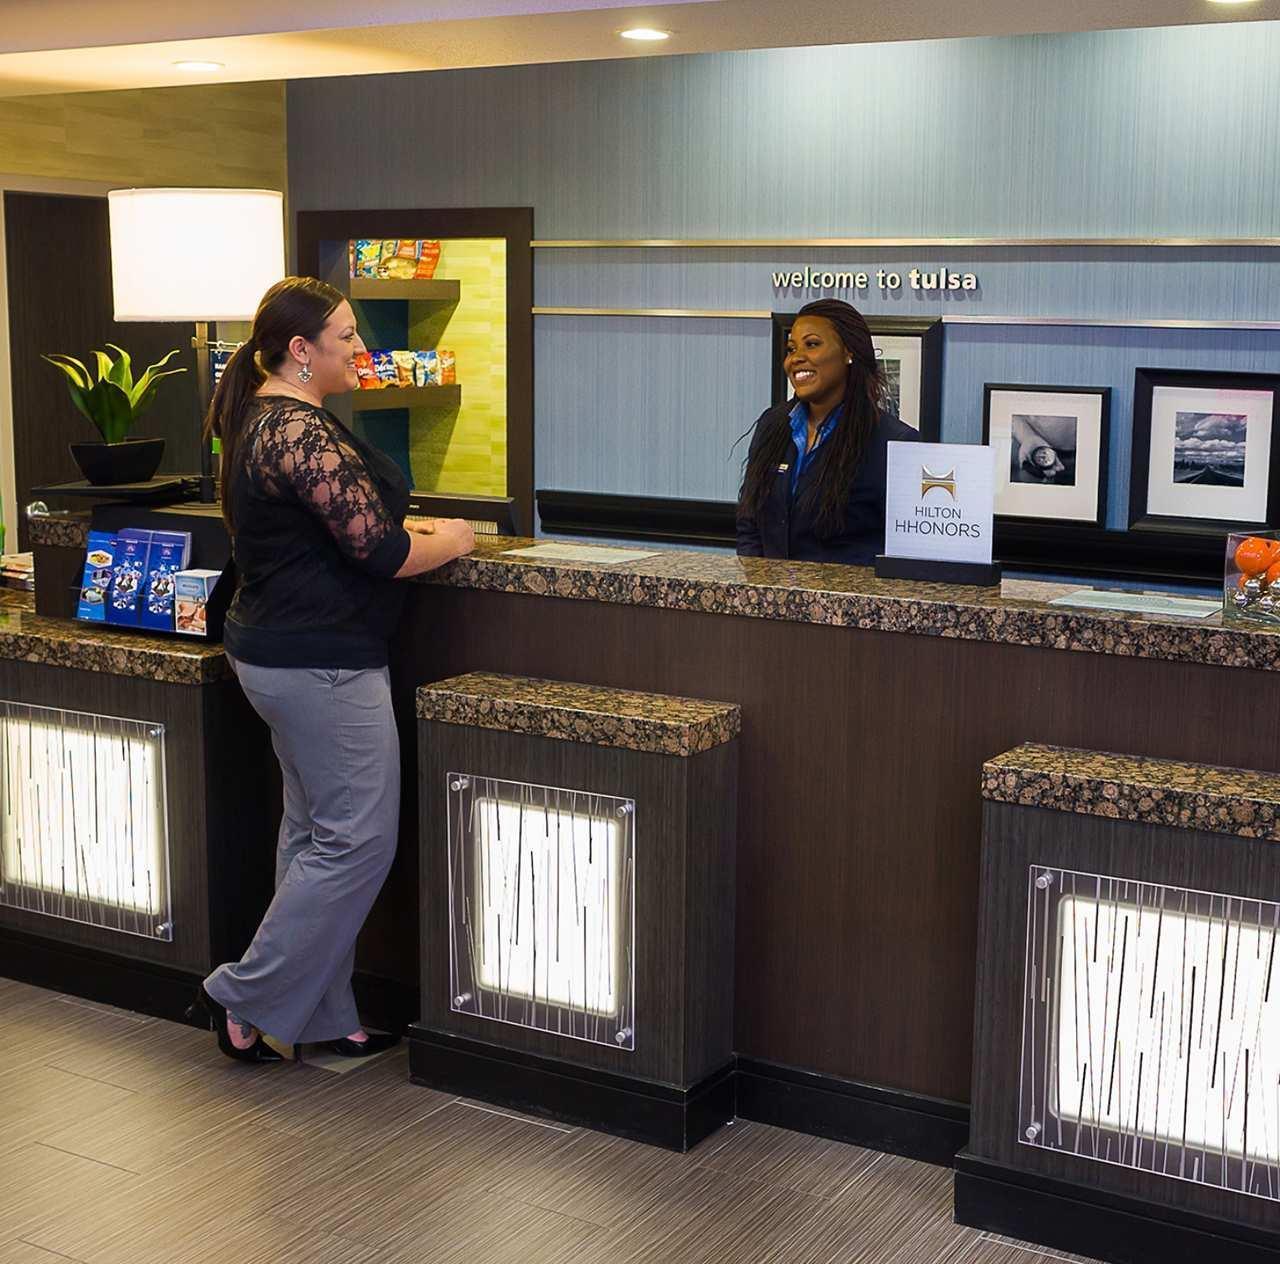 Hampton Inn & Suites Tulsa/Central image 2